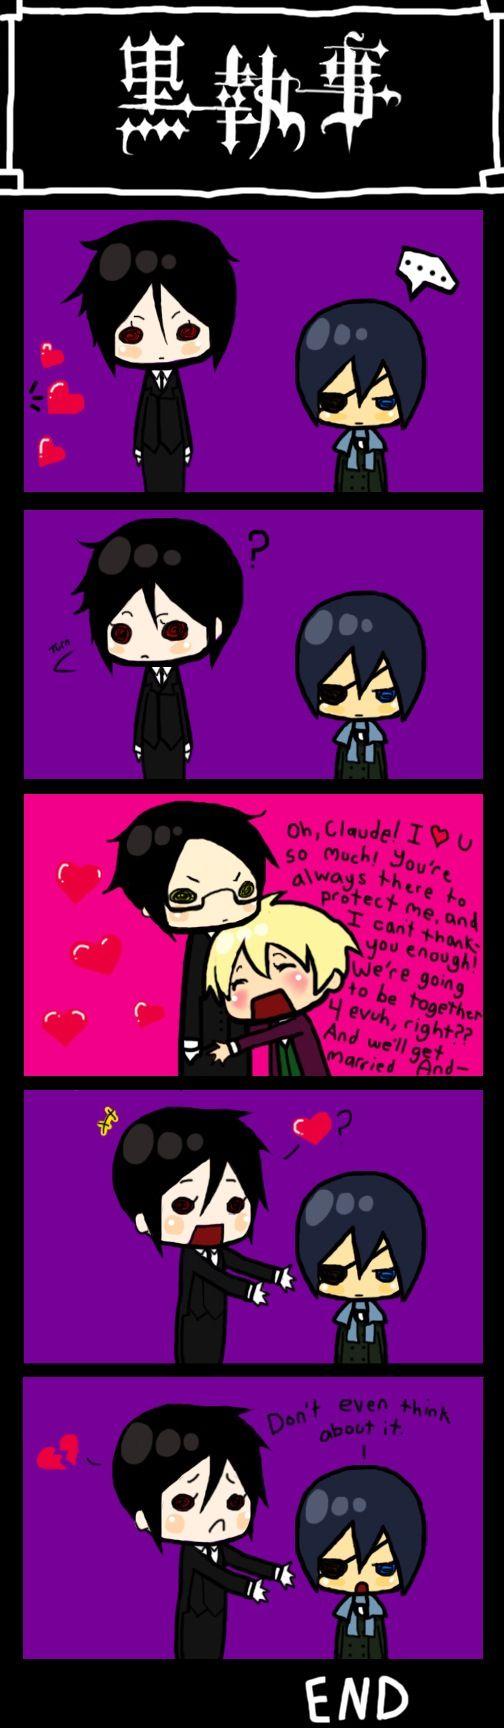 Black Butler poor Sebas-chan...:(